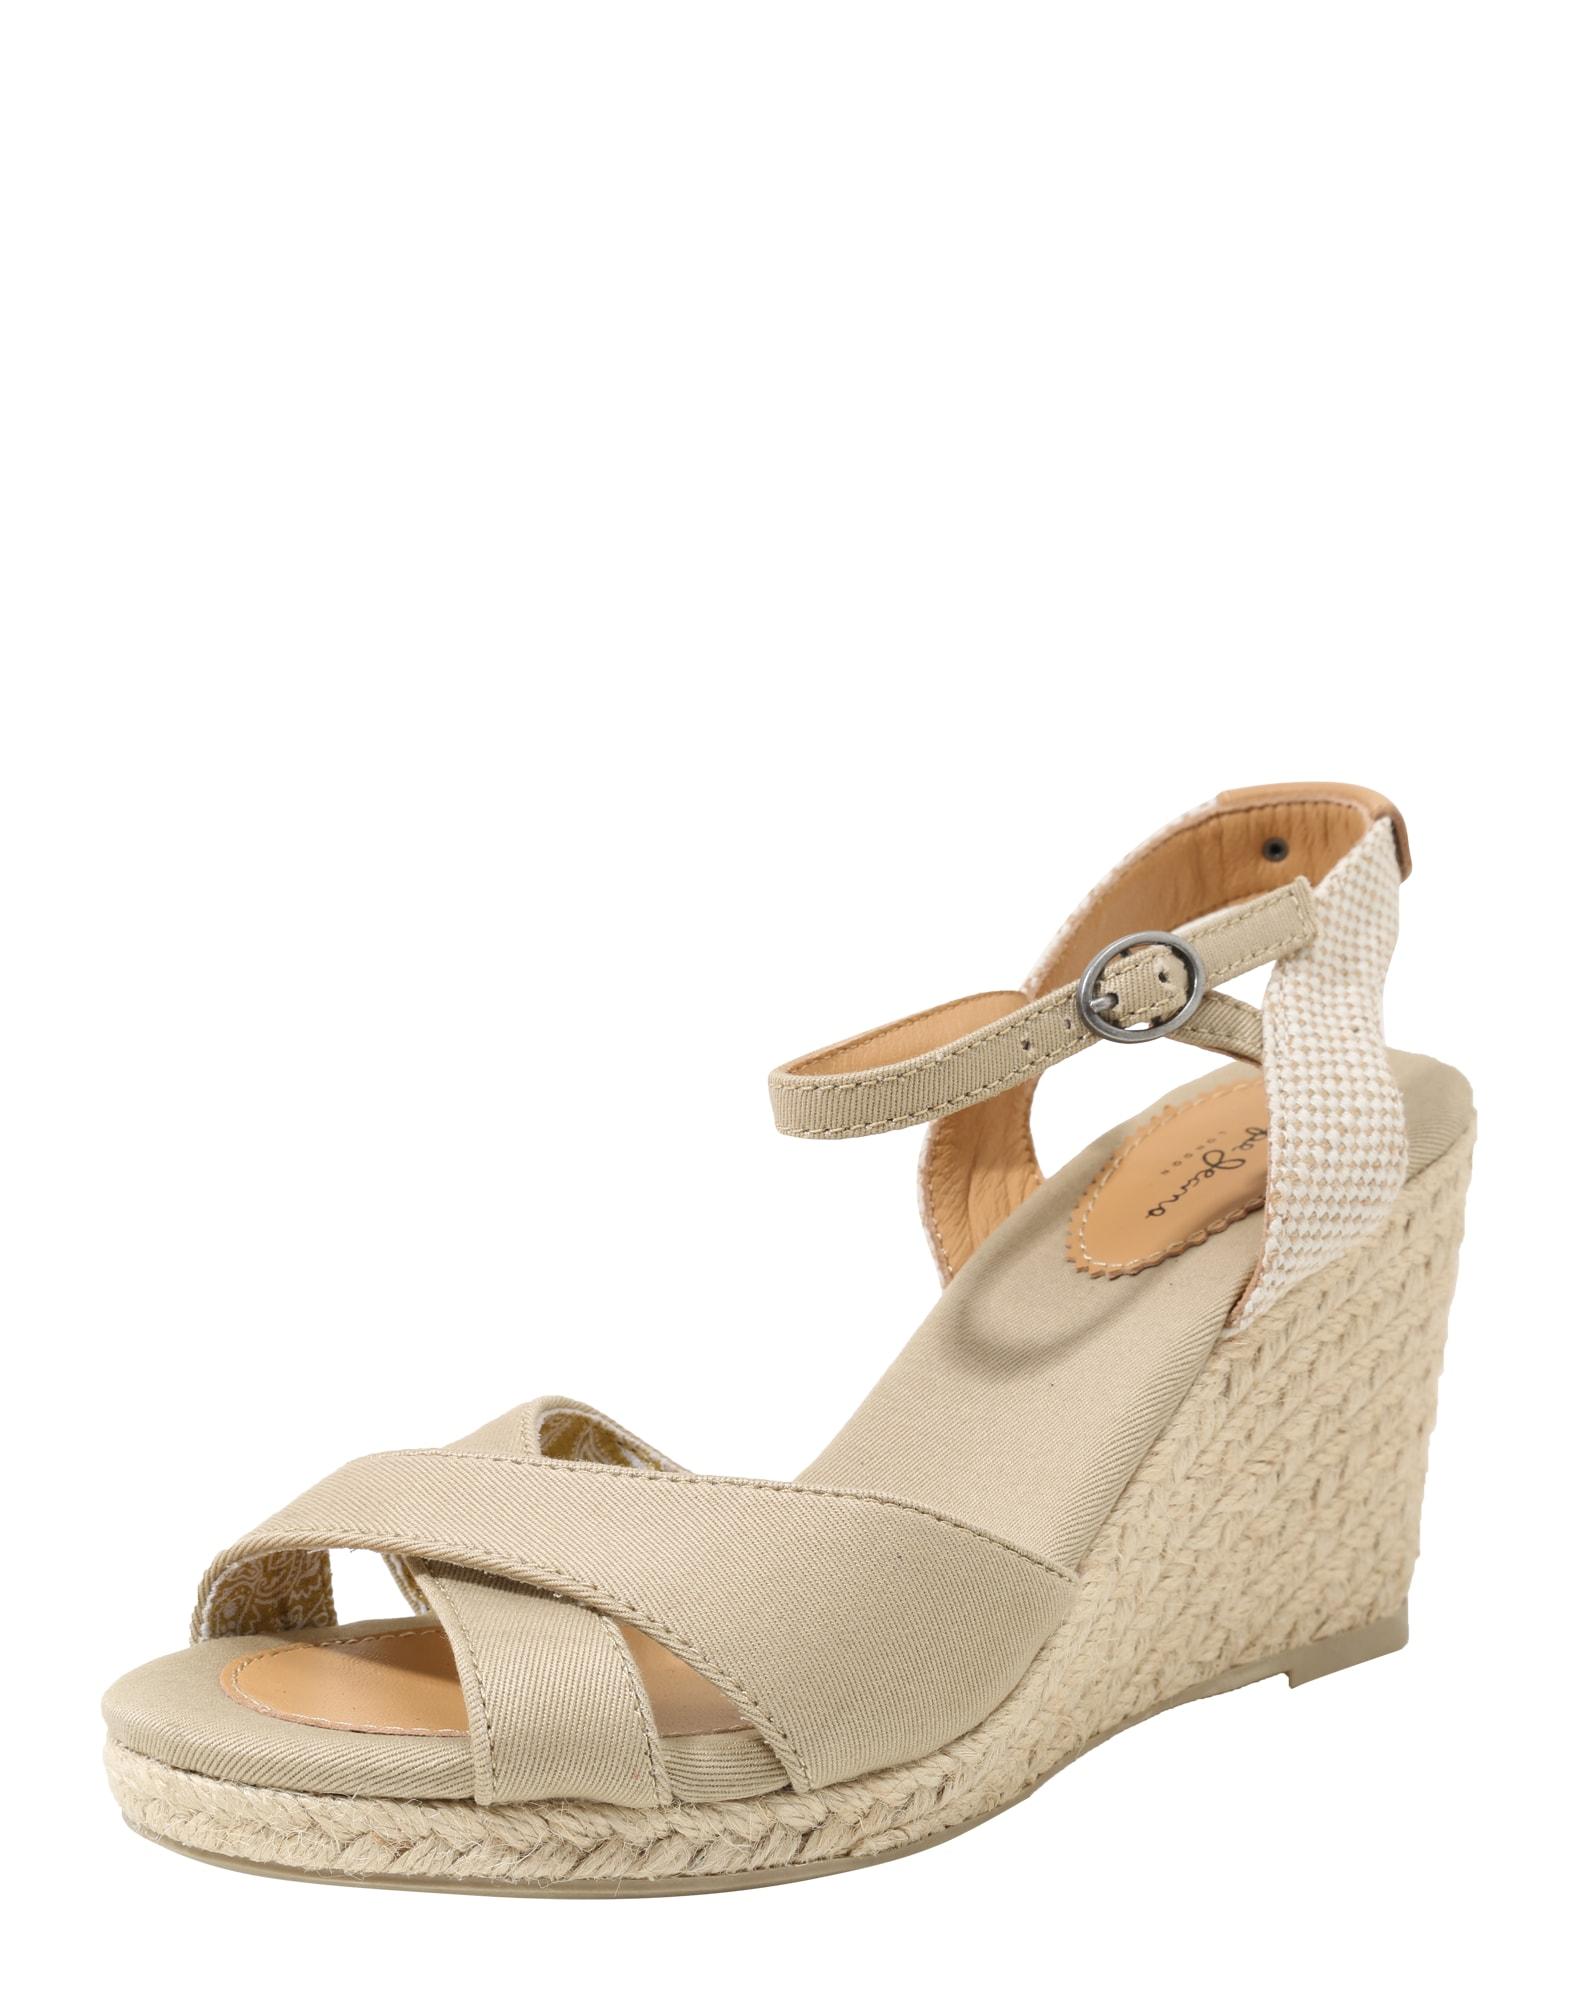 Pepe Jeans Dames Sandalen met riem Shark beige